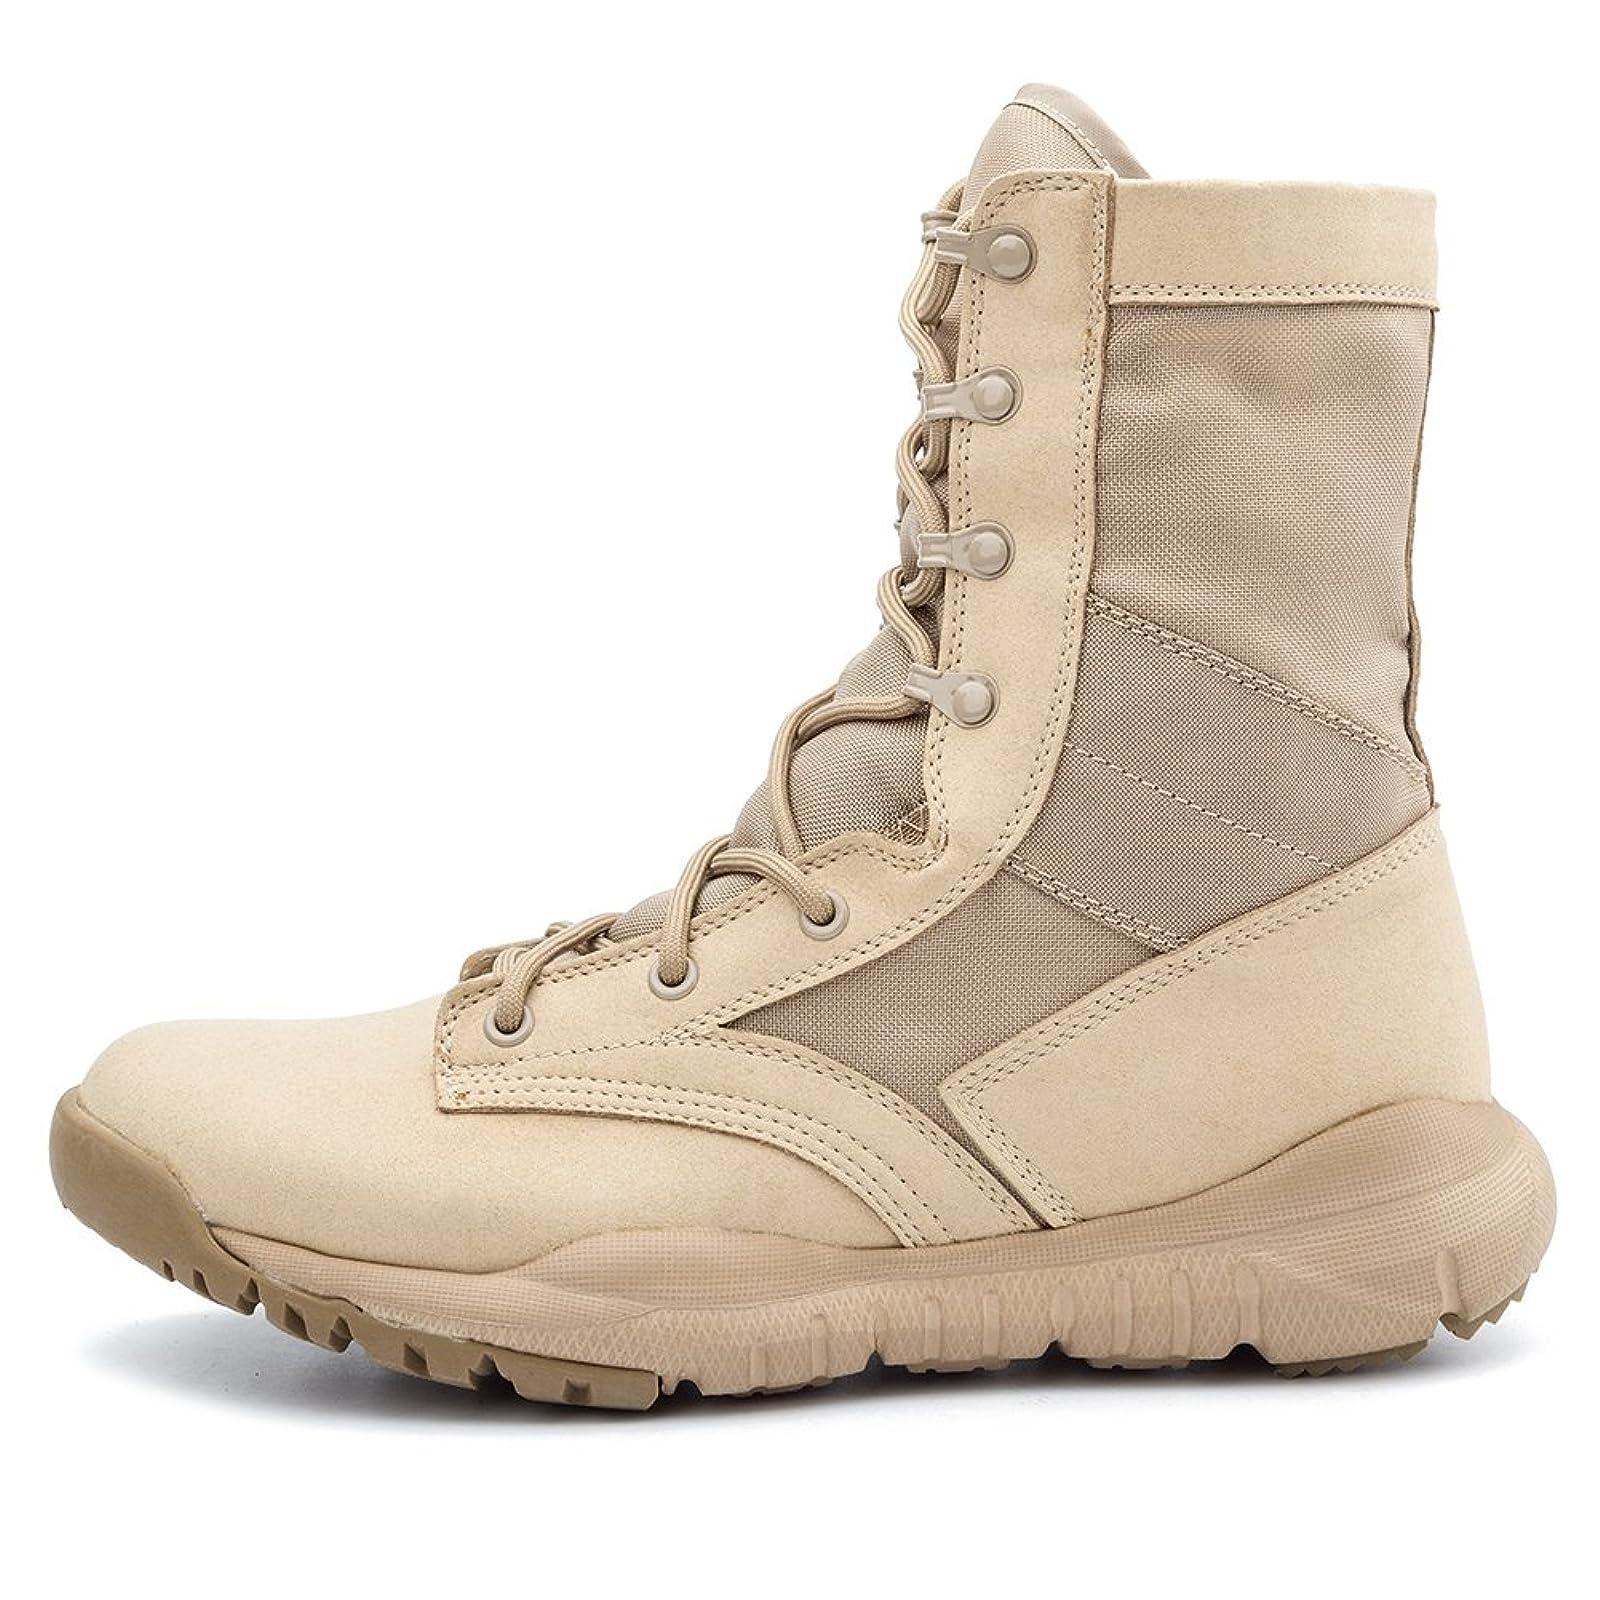 IODSON US Mens' Ultra-Light Combat Boots Beige 9.5 M US - 1